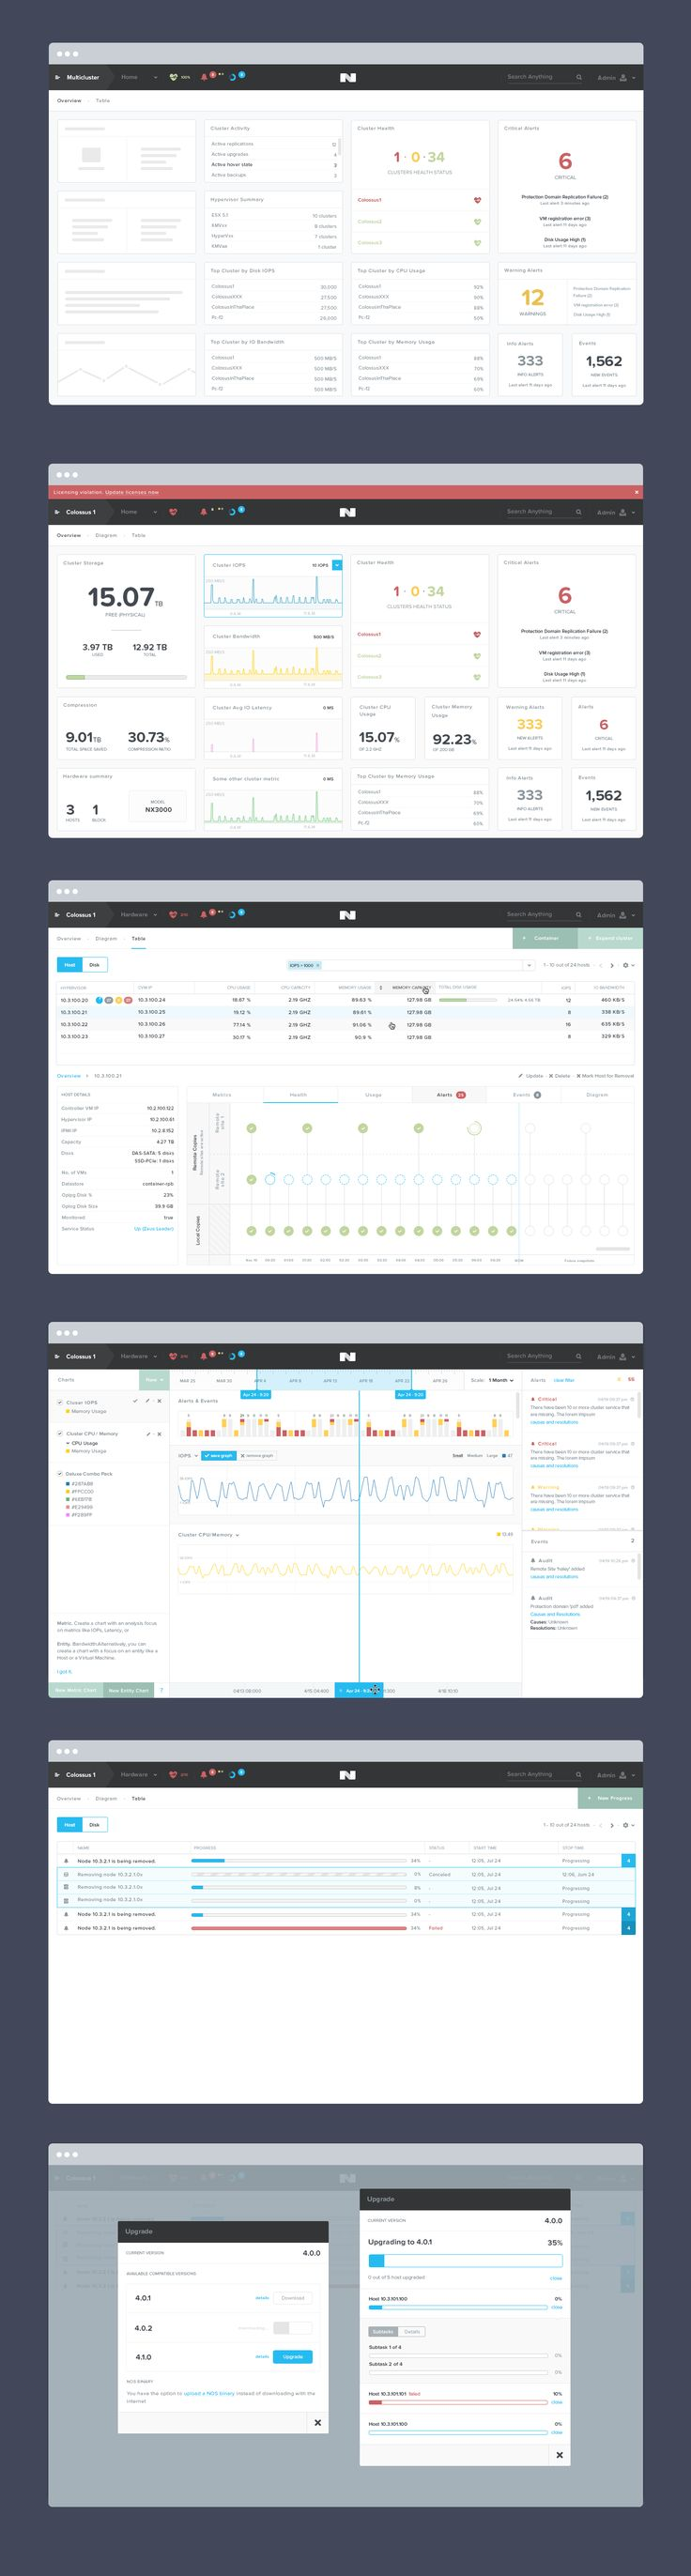 Nutanix Design Iteration Presentation